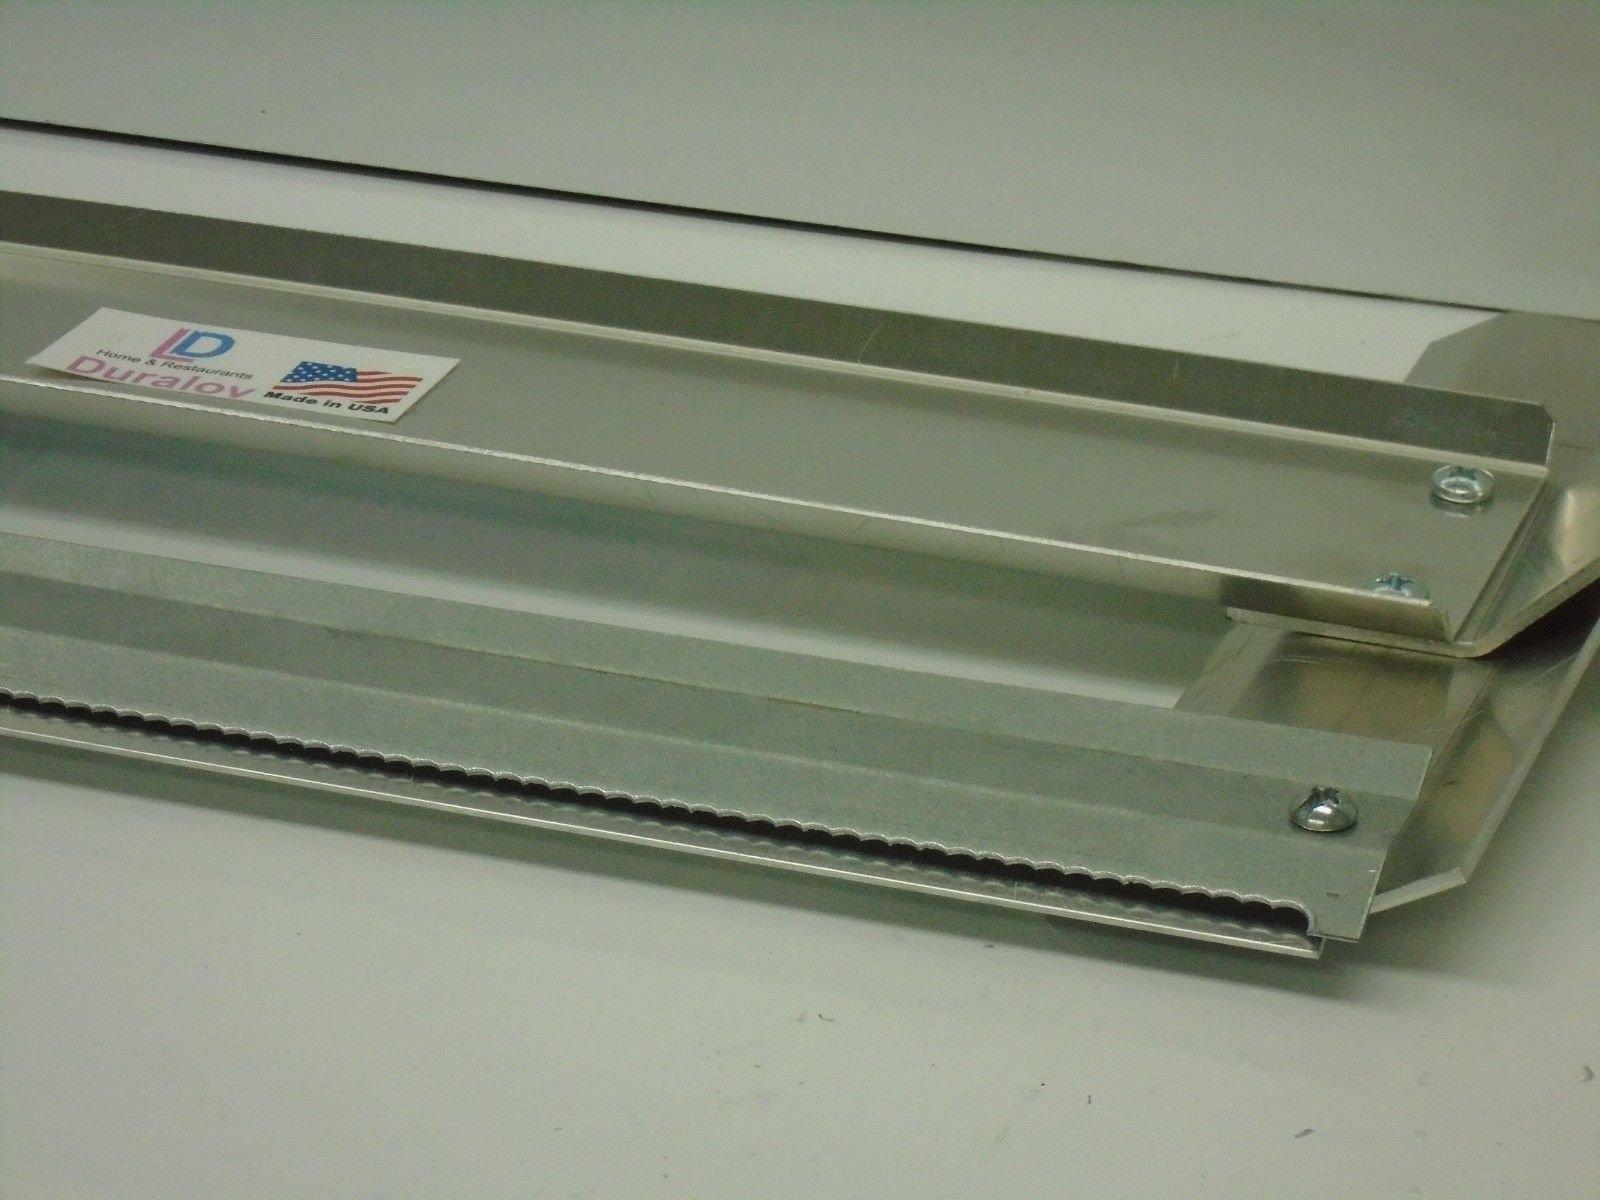 Paper Cutter Roll Dispenser Econoline 18 inches table mount Kraft paper Duralov by Duralov (Image #7)